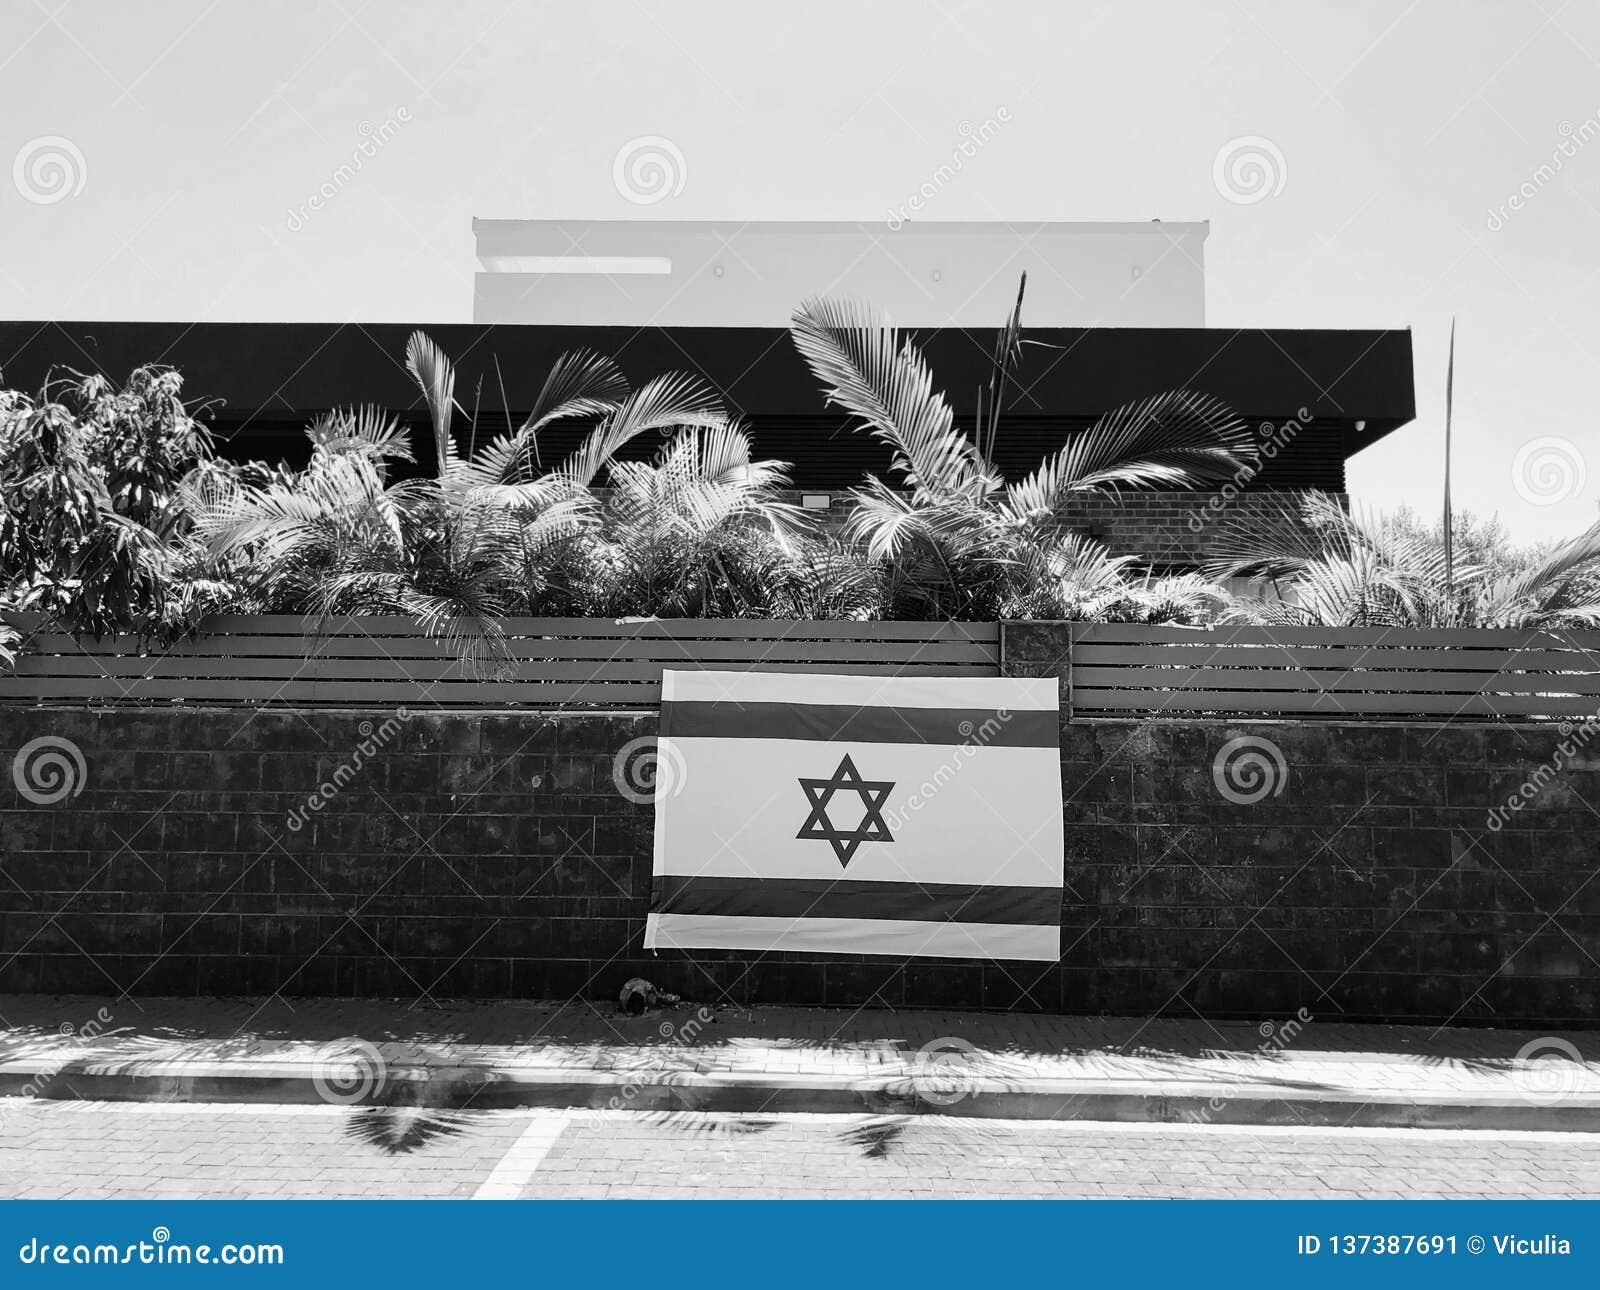 RISHON LE ZION, ΙΣΡΑΗΛ - 27 Ιουνίου 2018 εθνική σημαία του Ισραήλ, η οποία είναι ένας φράκτης ιδιωτικών κατοικιών Rishon LE Zion,